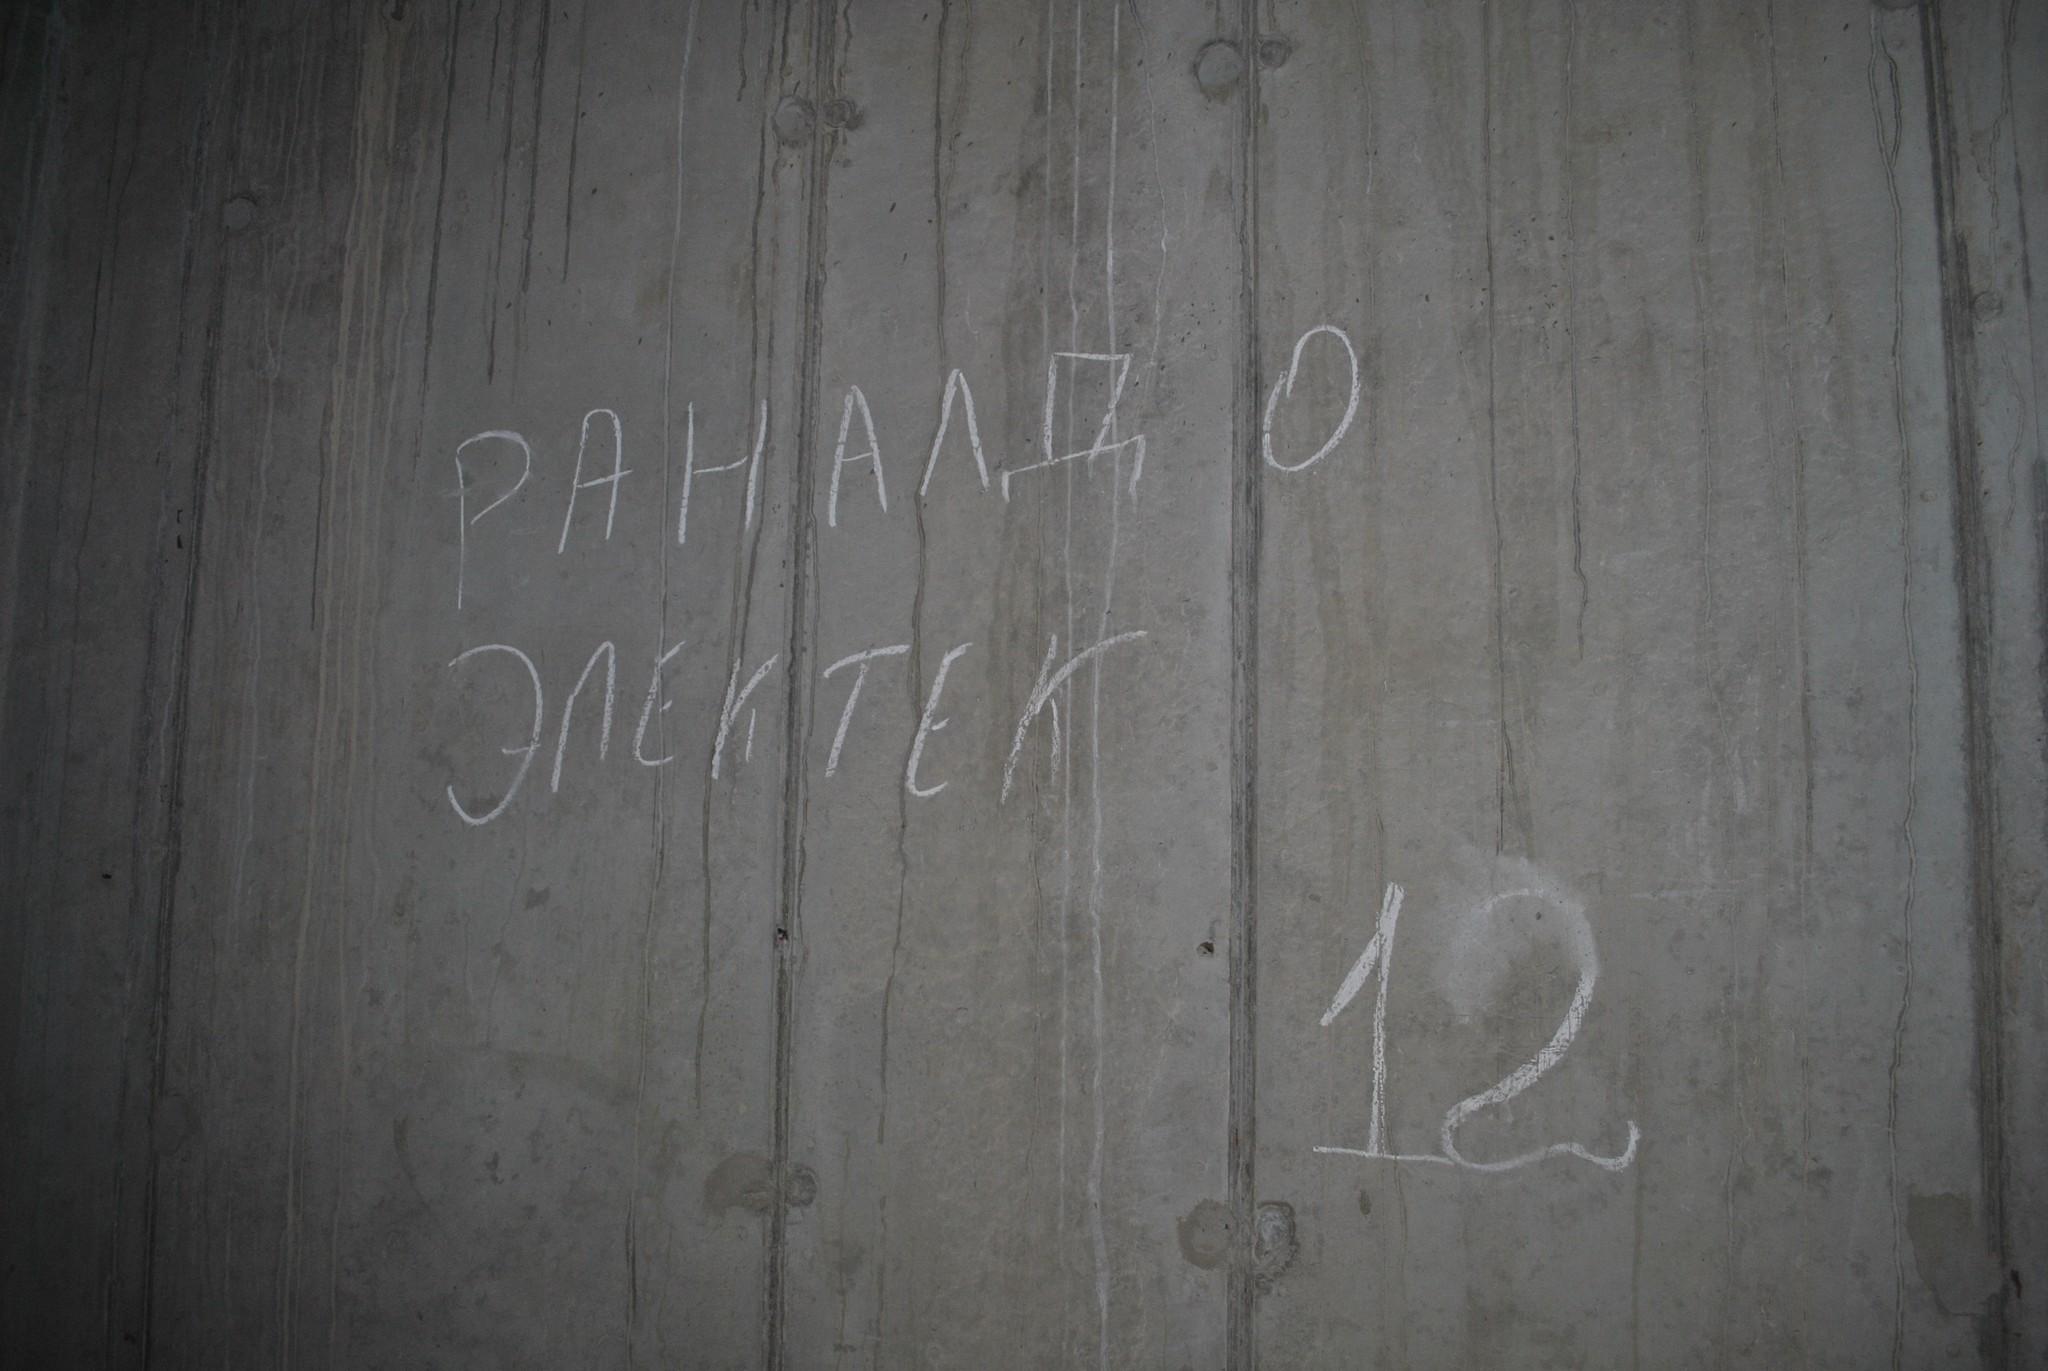 h-1752.jpg